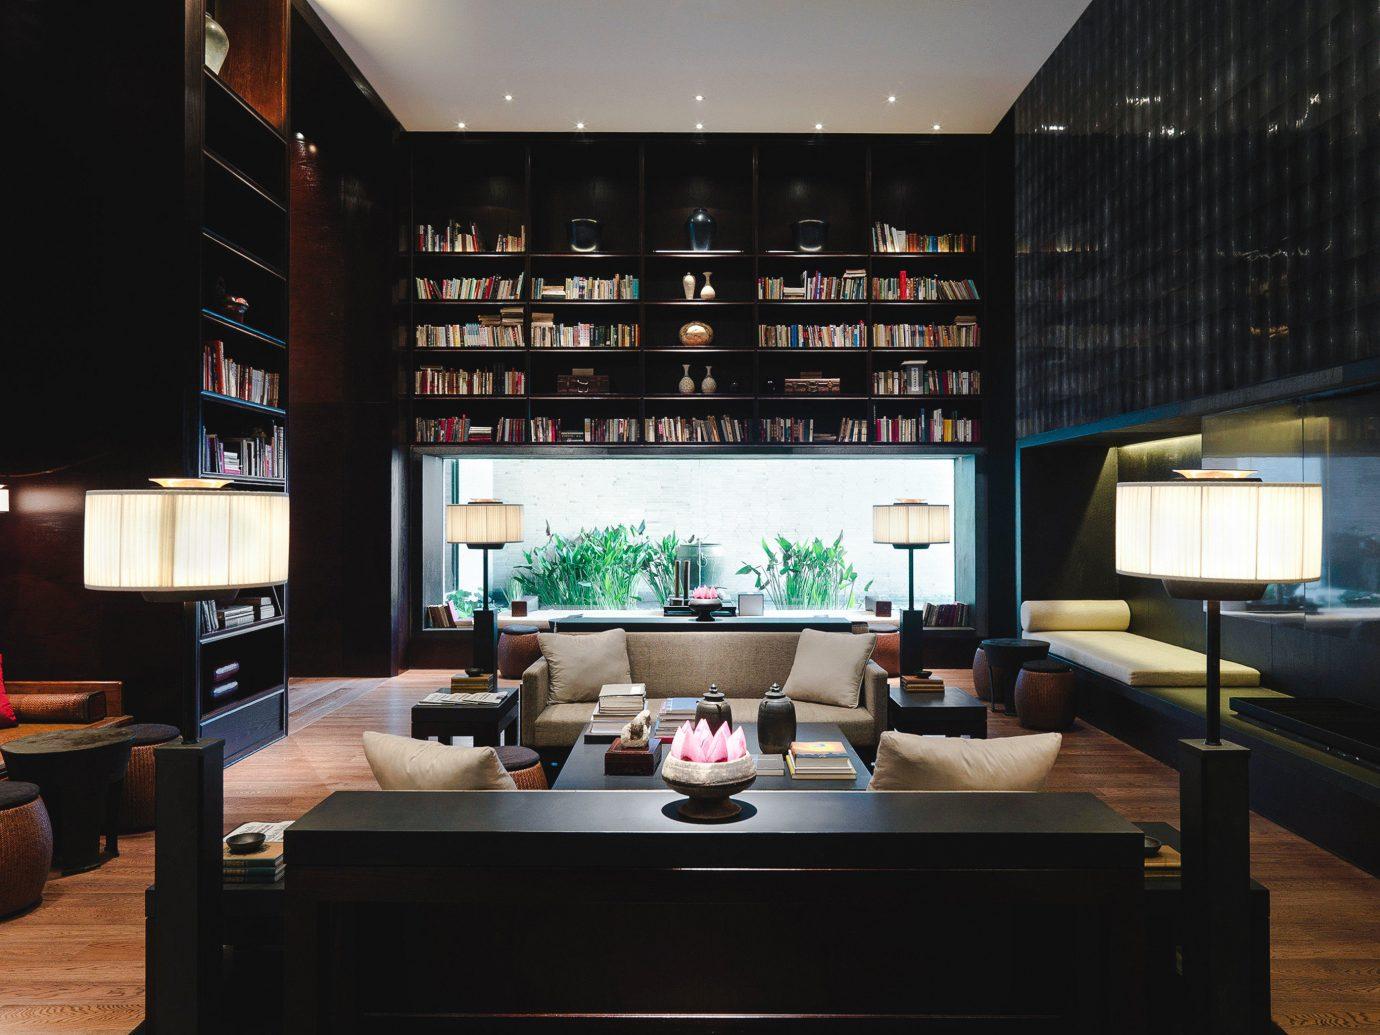 Boutique Hotels Luxury Travel indoor living room interior design room Living Lobby window ceiling restaurant interior designer furniture table